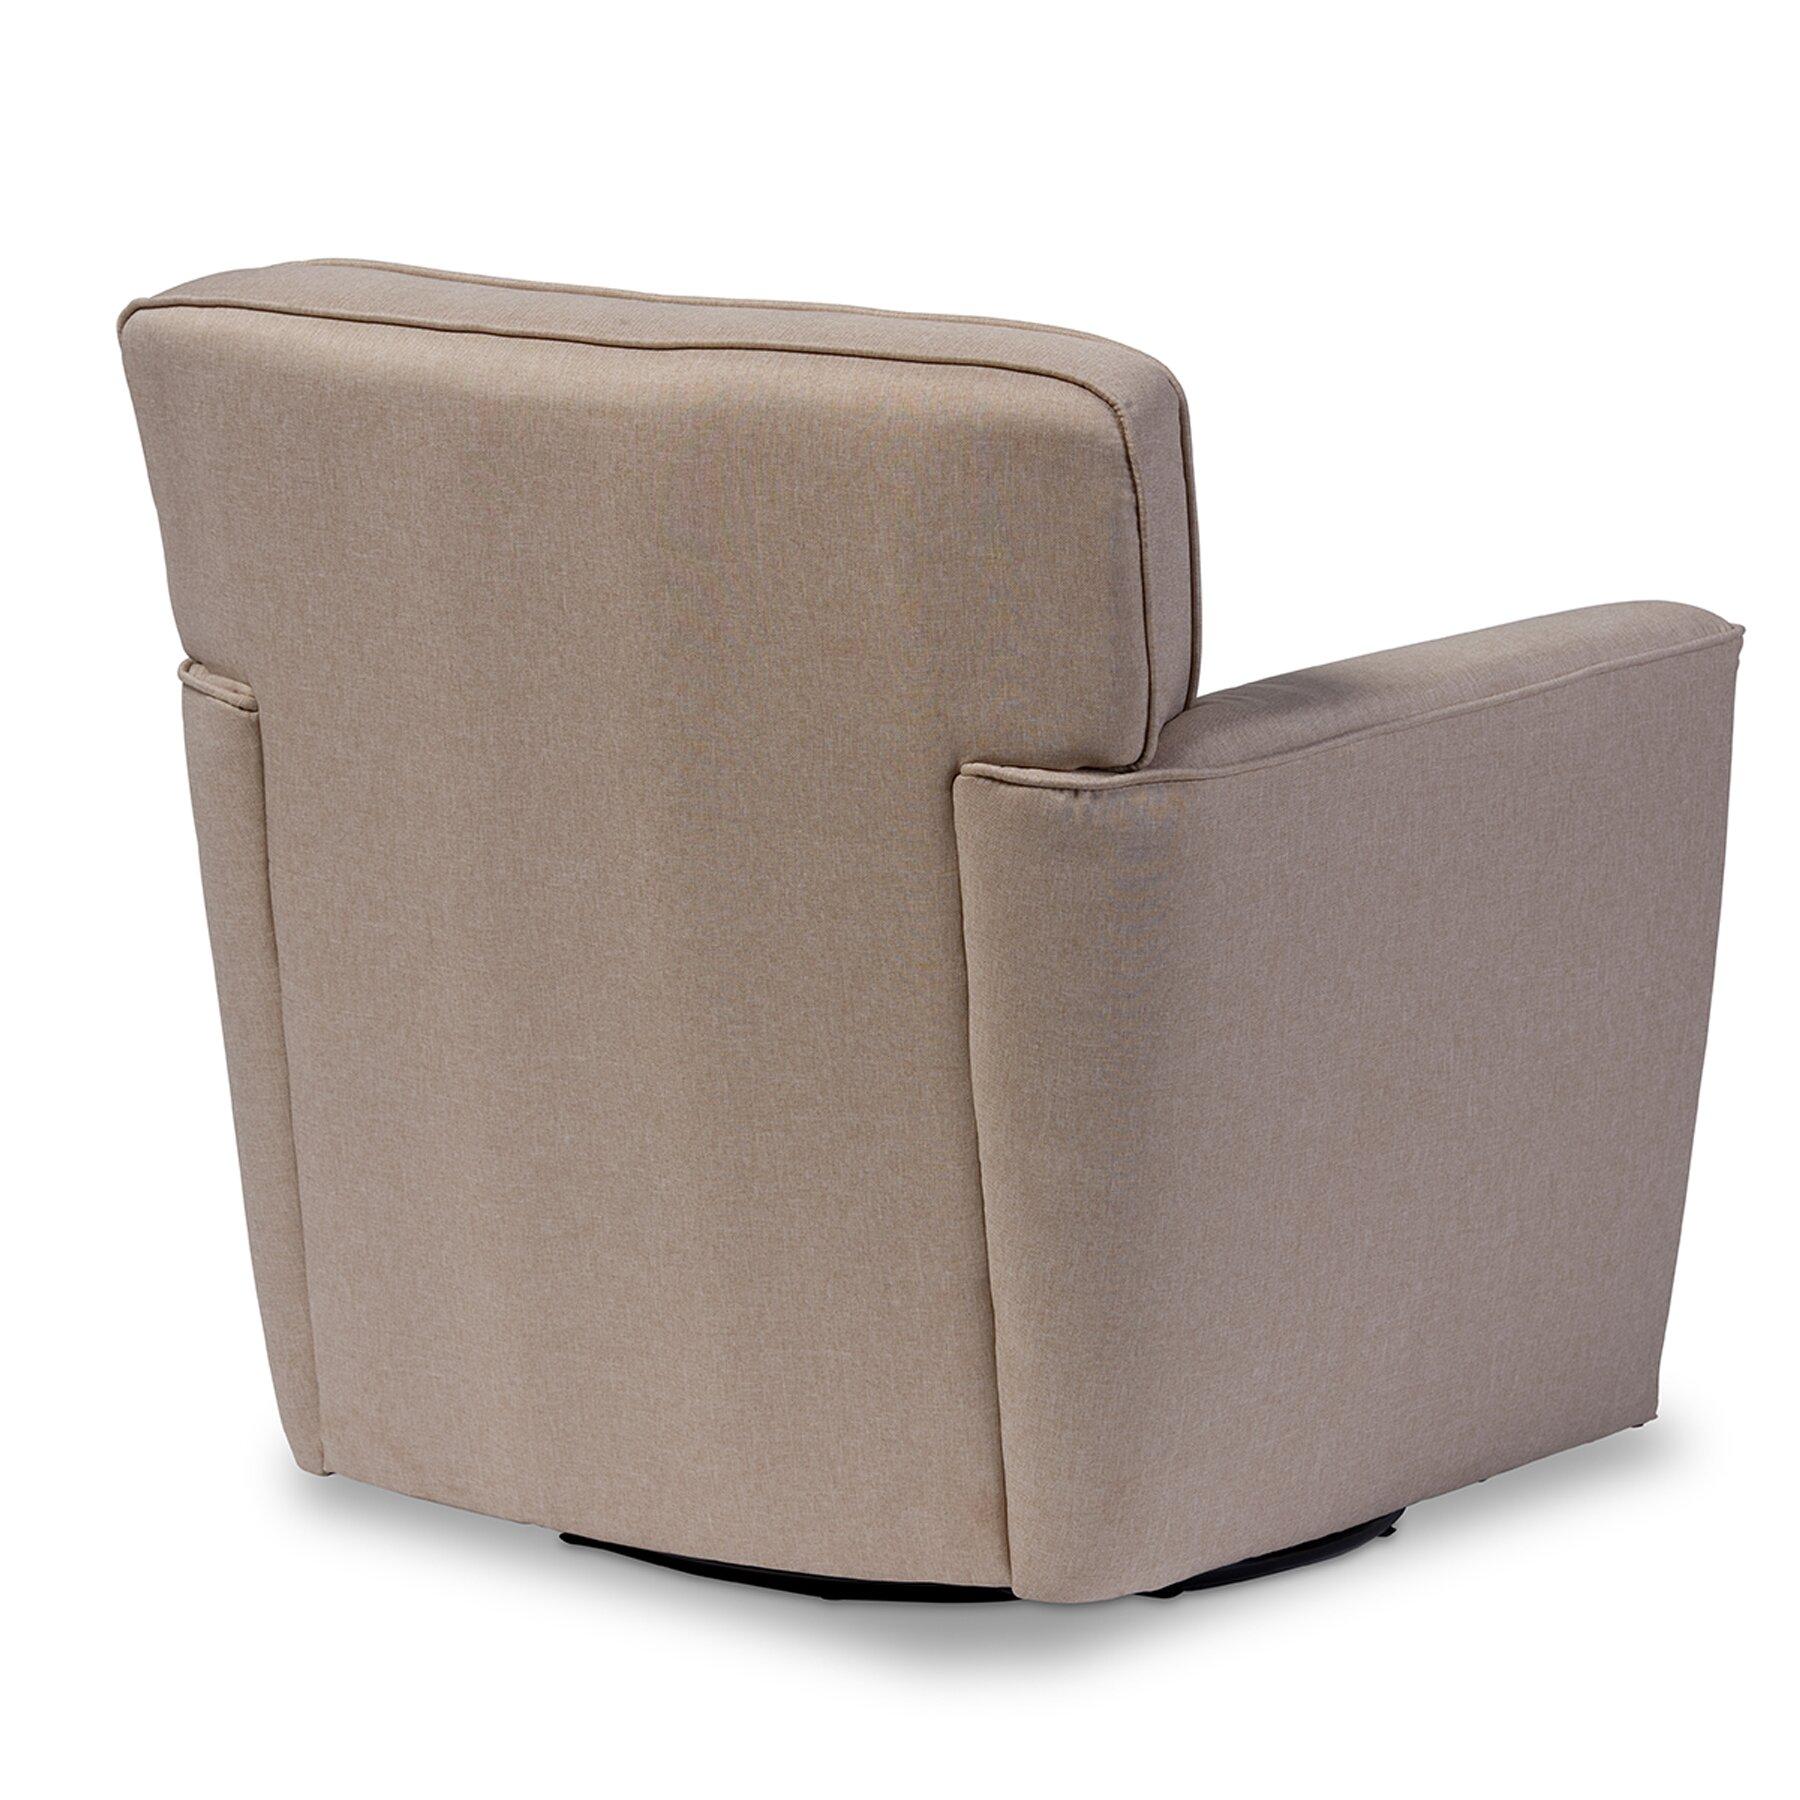 wholesale interiors baxton studio retro upholstered lounge chair baxton studio lounge chair